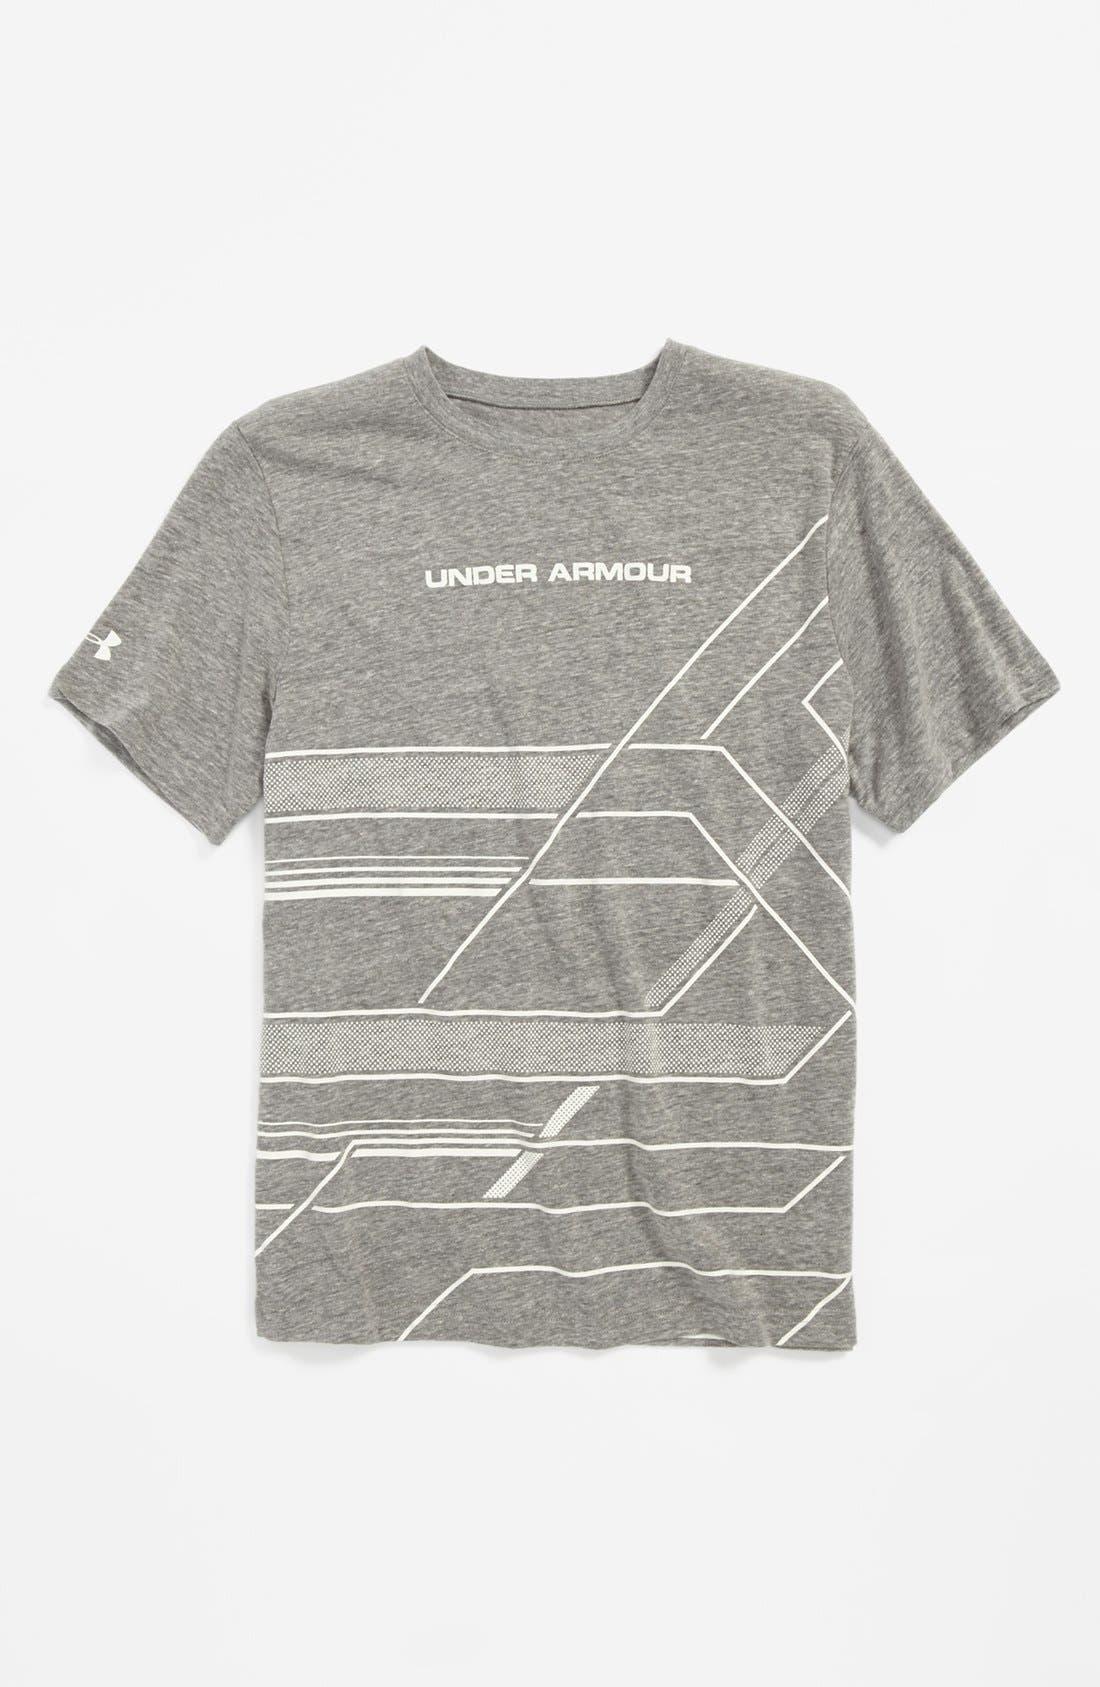 Main Image - Under Armour 'Domineer' T-Shirt (Big Boys)